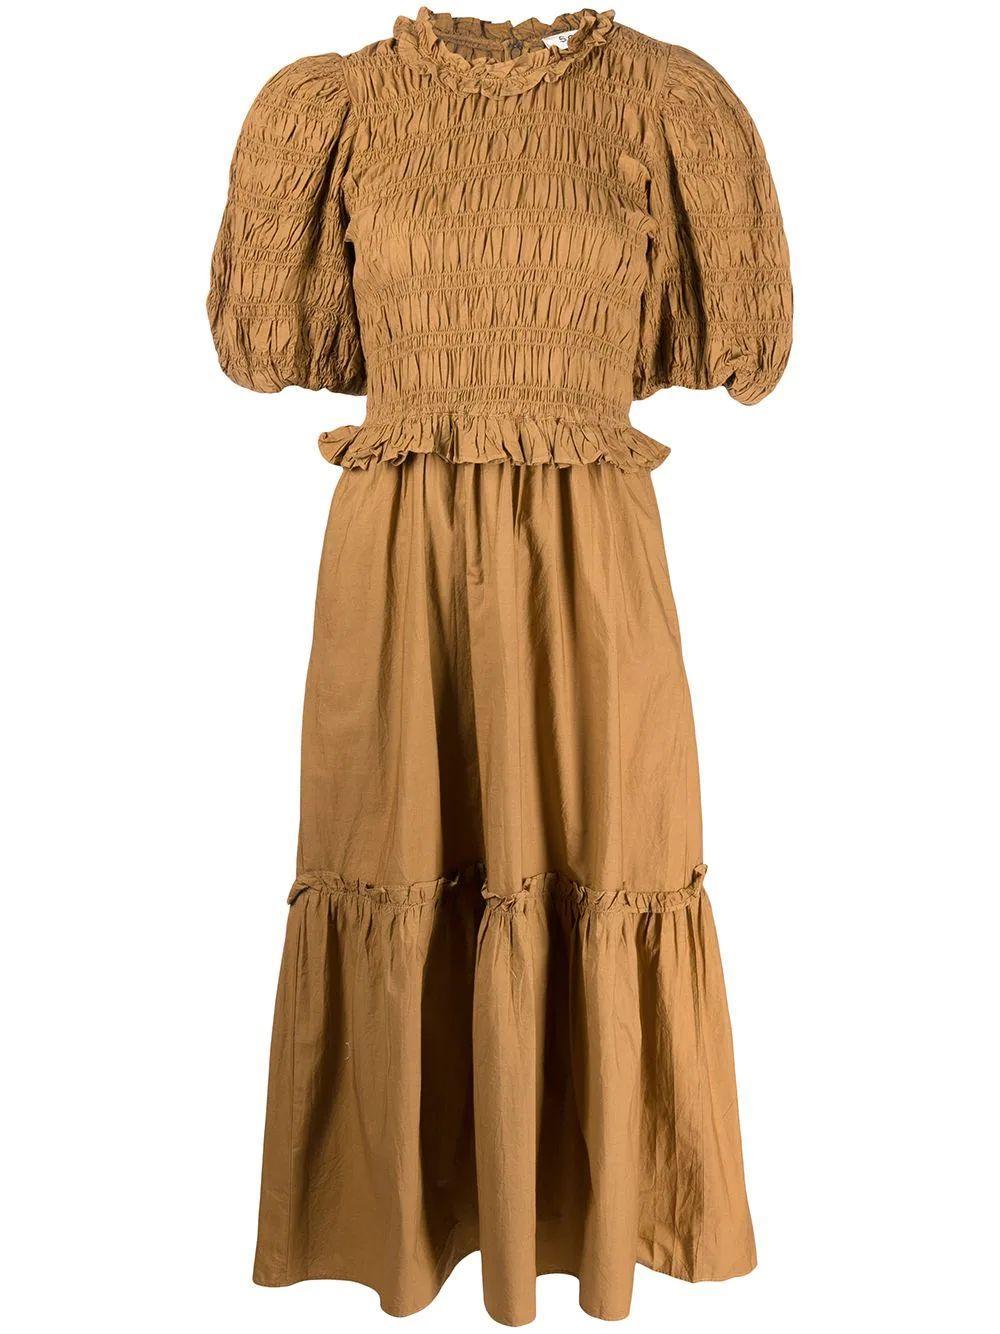 Rene Cotton Puff Sleeve Dress Item # AW21-049